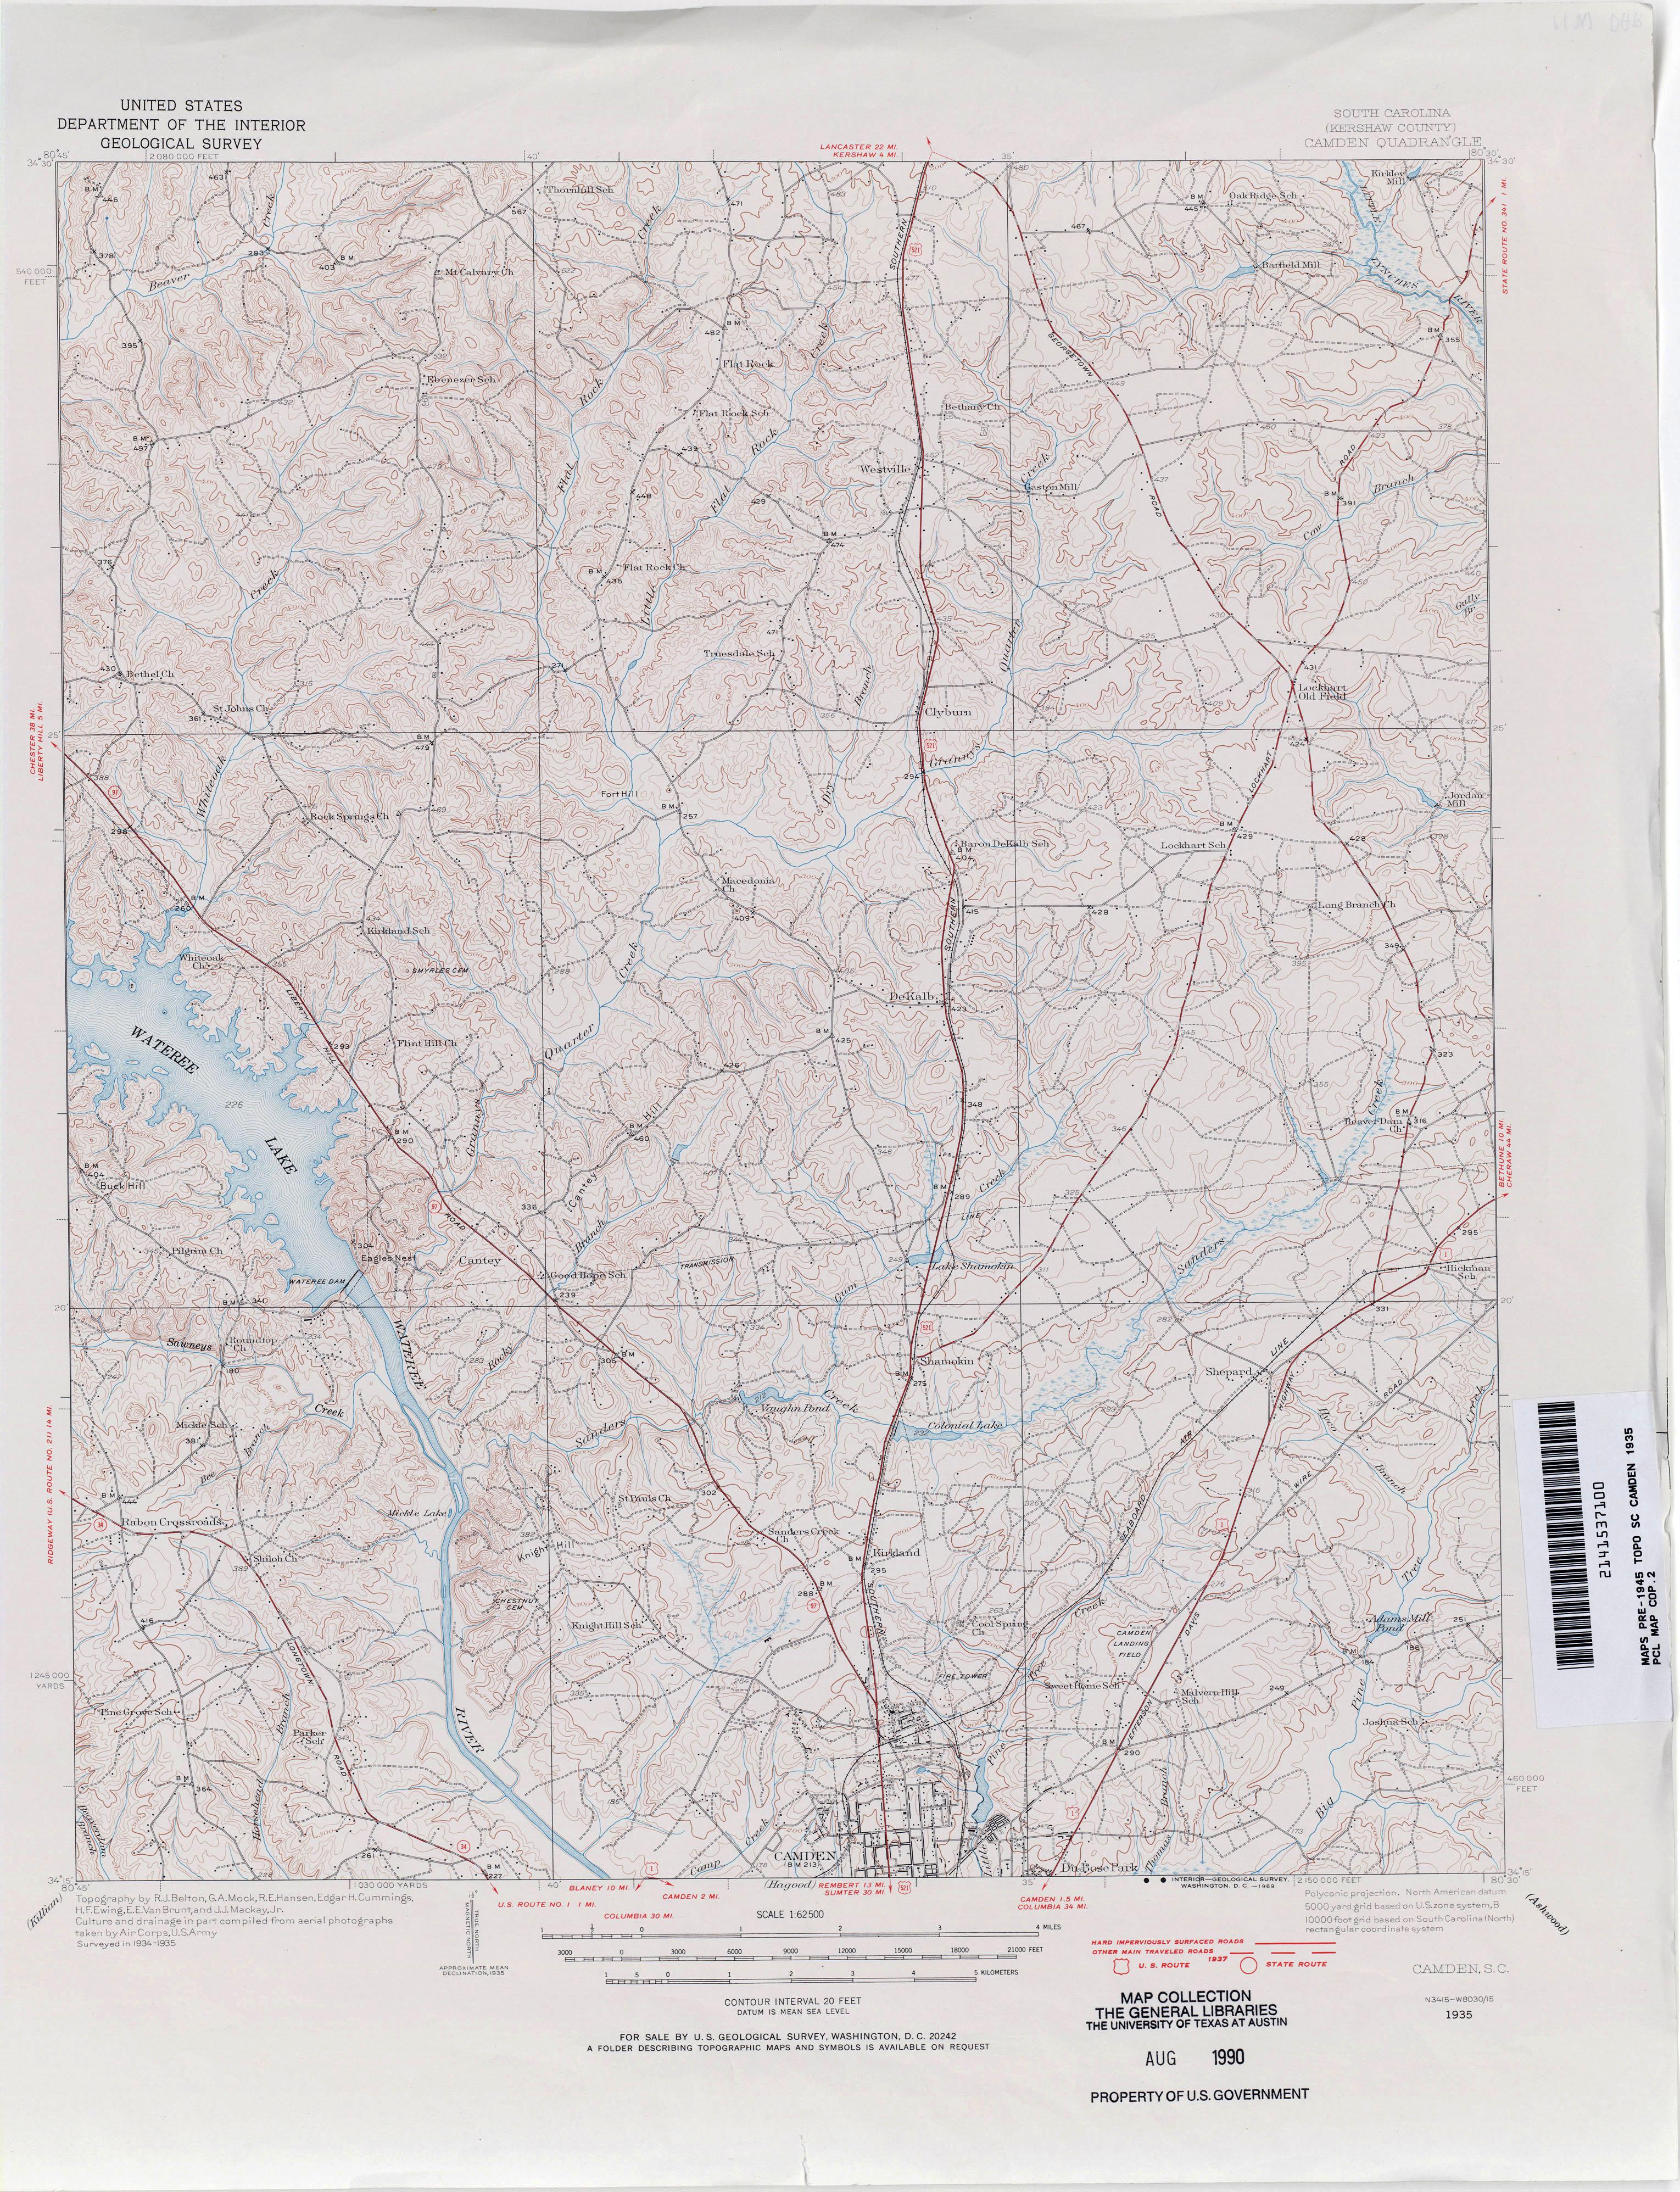 South Carolina Historical Topographic Maps - Perry-Castañeda Map ...